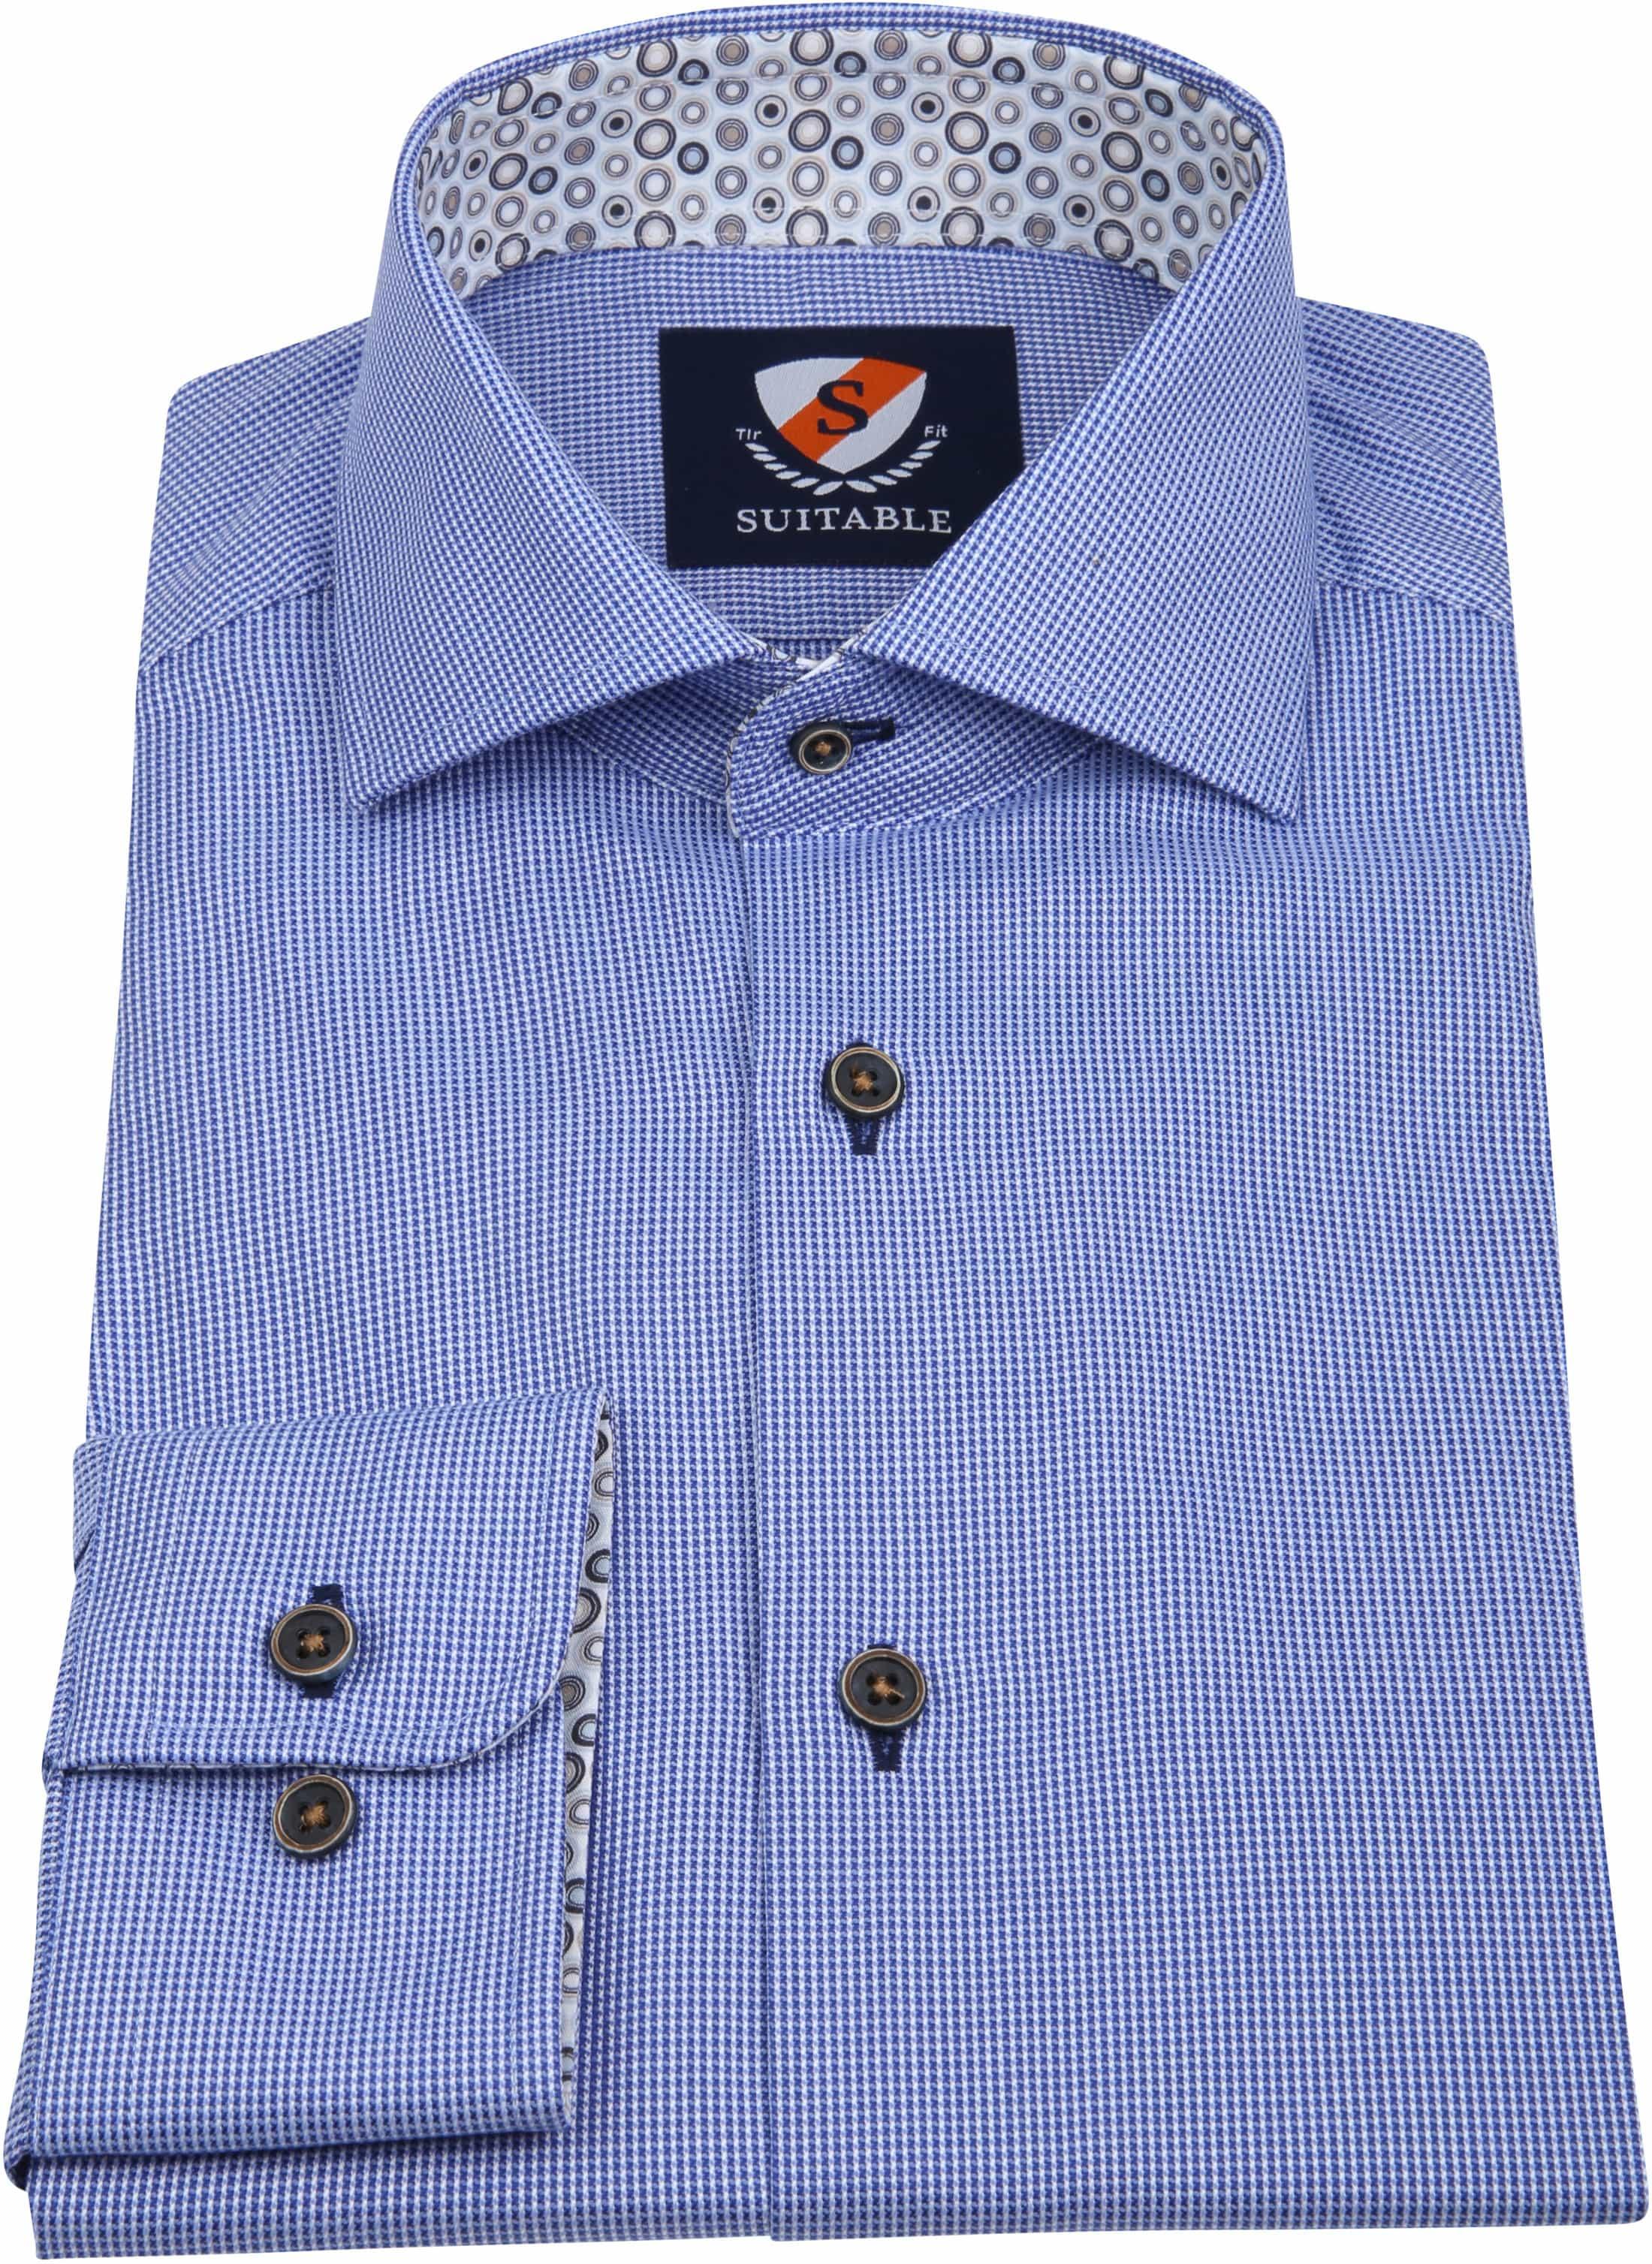 Suitable Overhemd Wesley Blauw foto 2